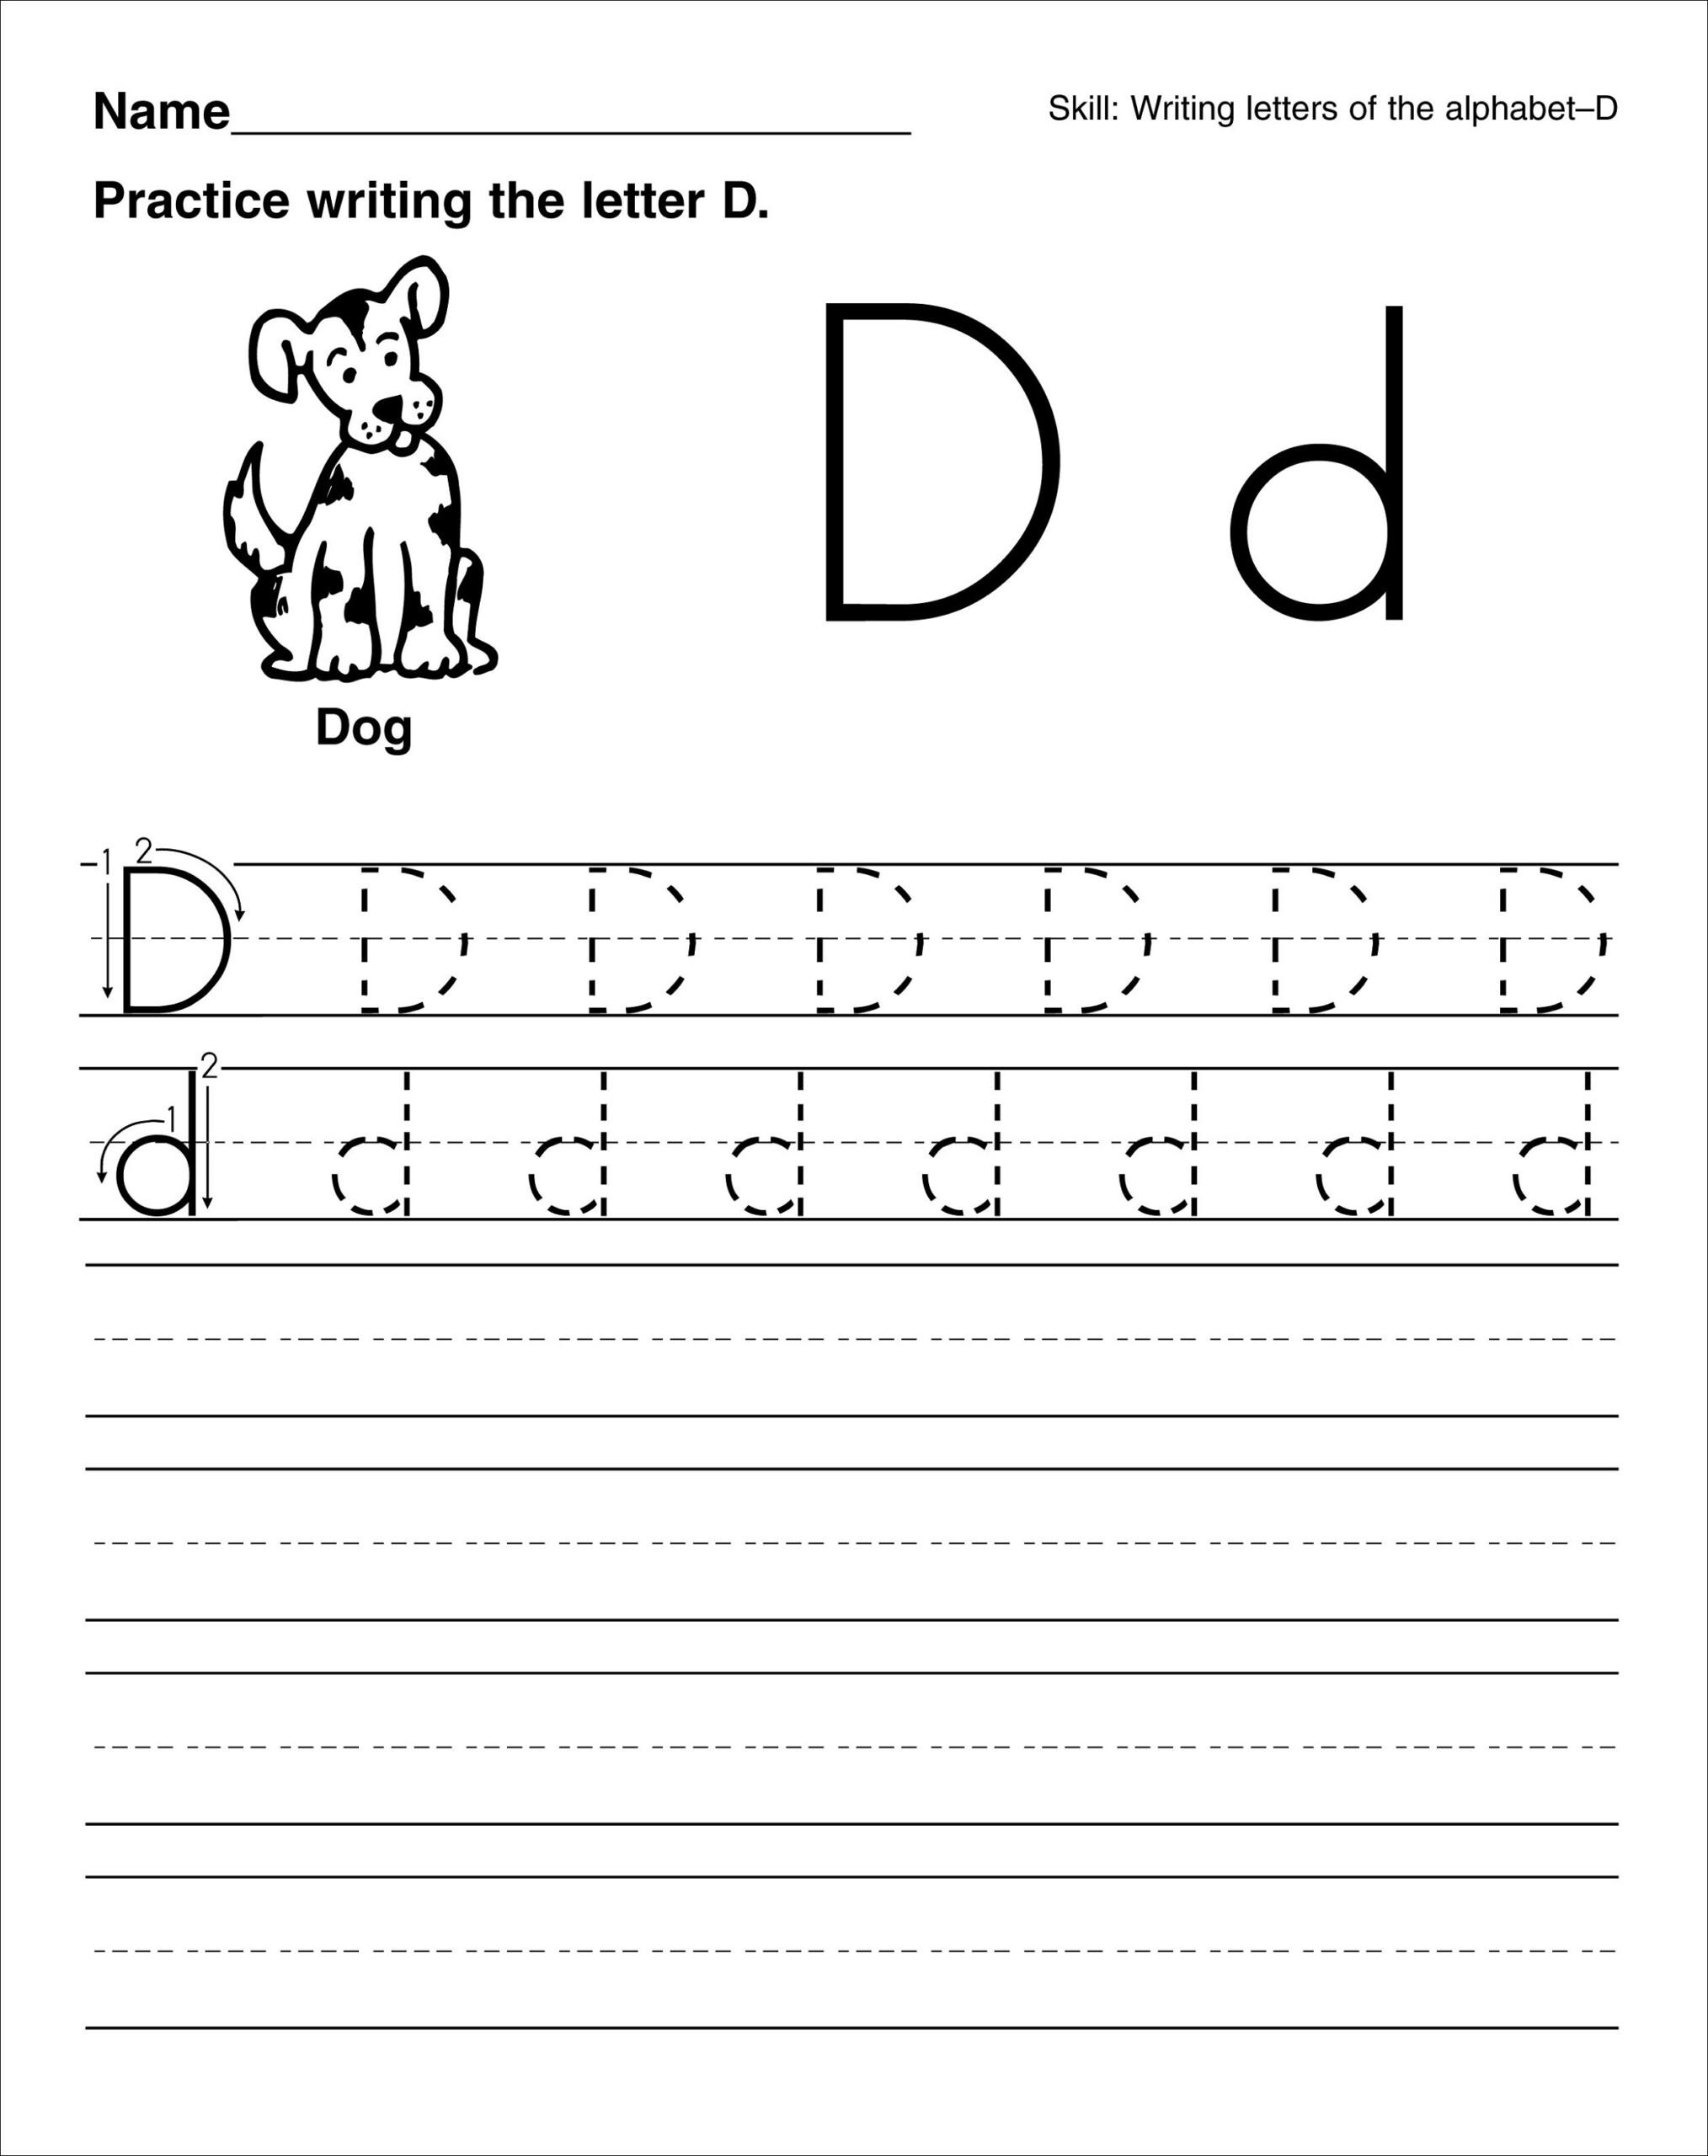 Forming Letters Worksheet   Printable Worksheets And throughout Letter L Worksheets Sparklebox